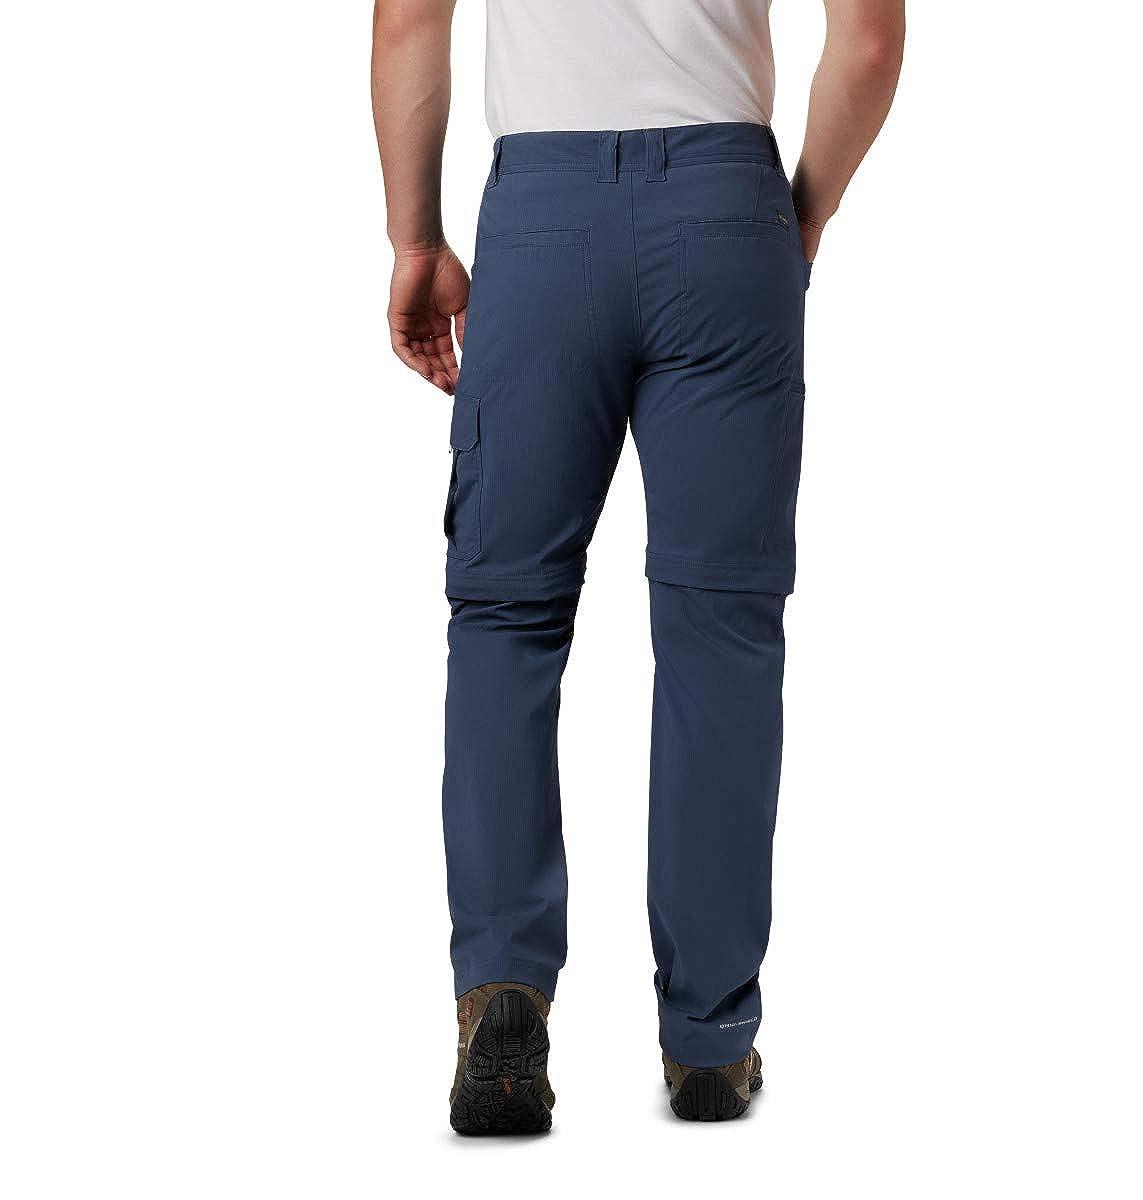 UPF 50 Sun Protection Columbia Mens Silver Ridge Convertible Pant Breathable